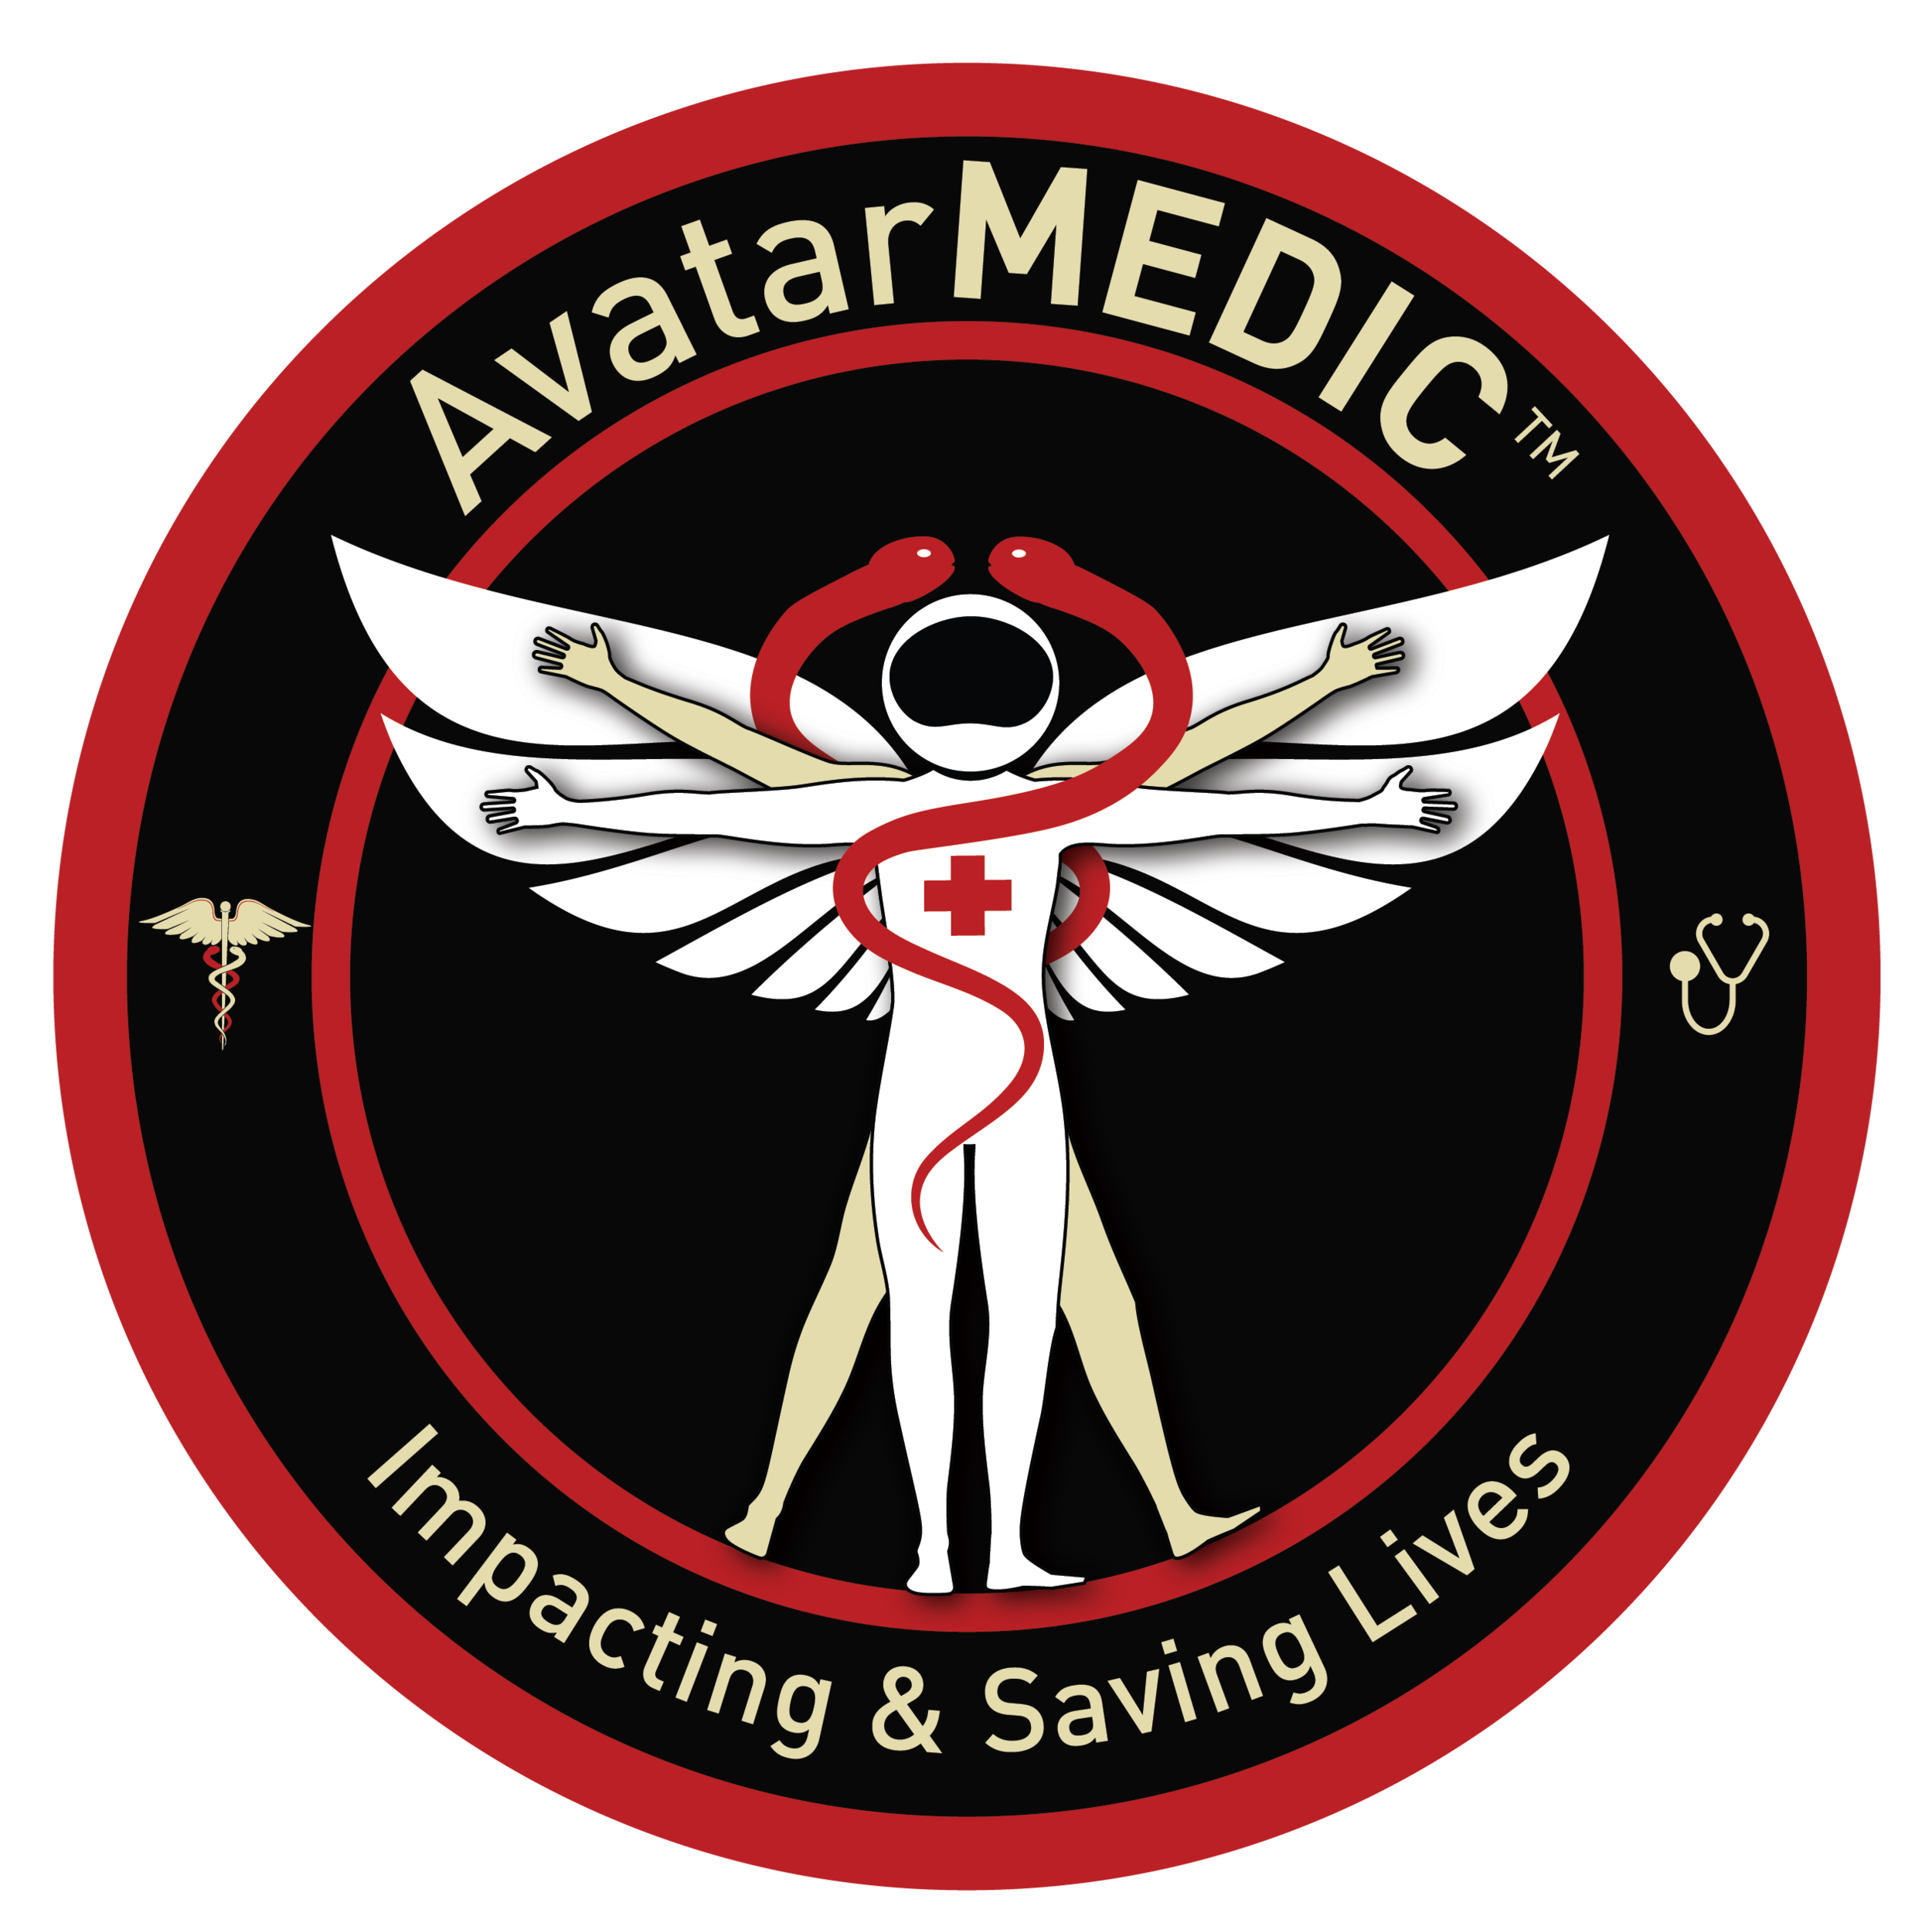 AvatarMedic_Logo_1.9_JH-01.png